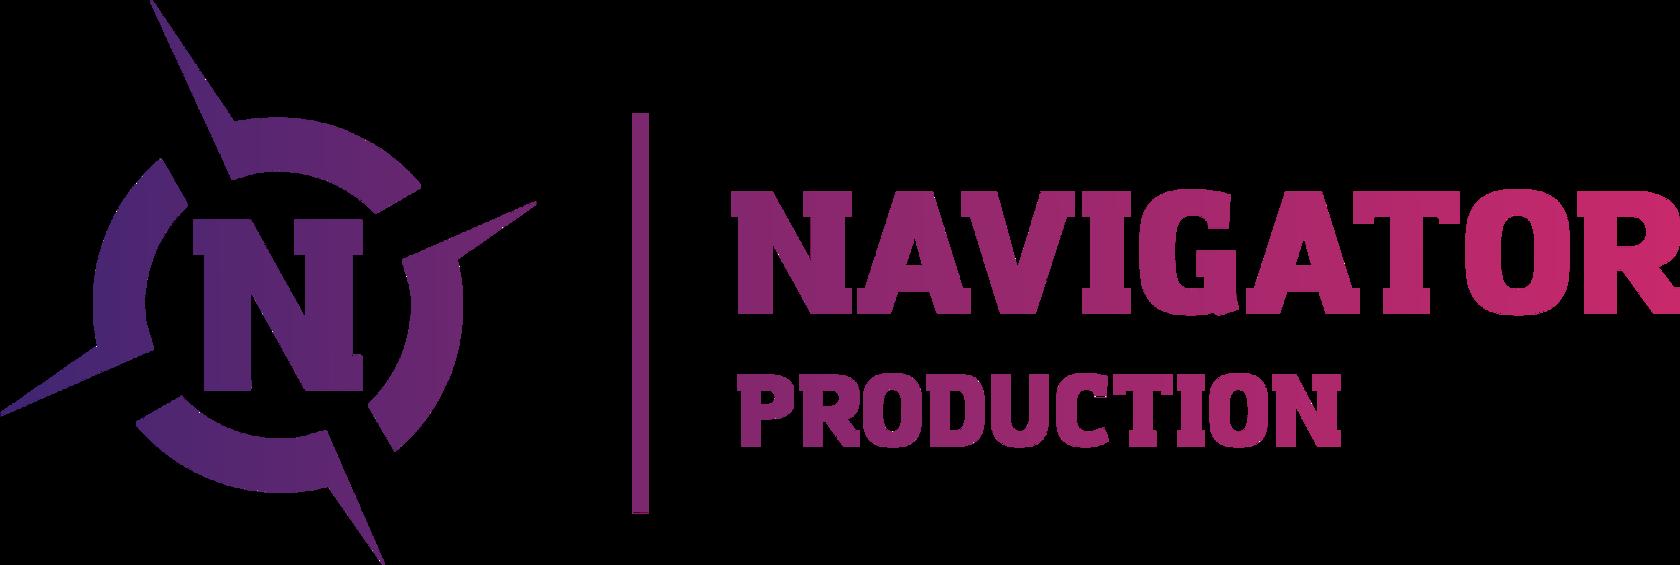 NAVIGATOR PRODUCTION